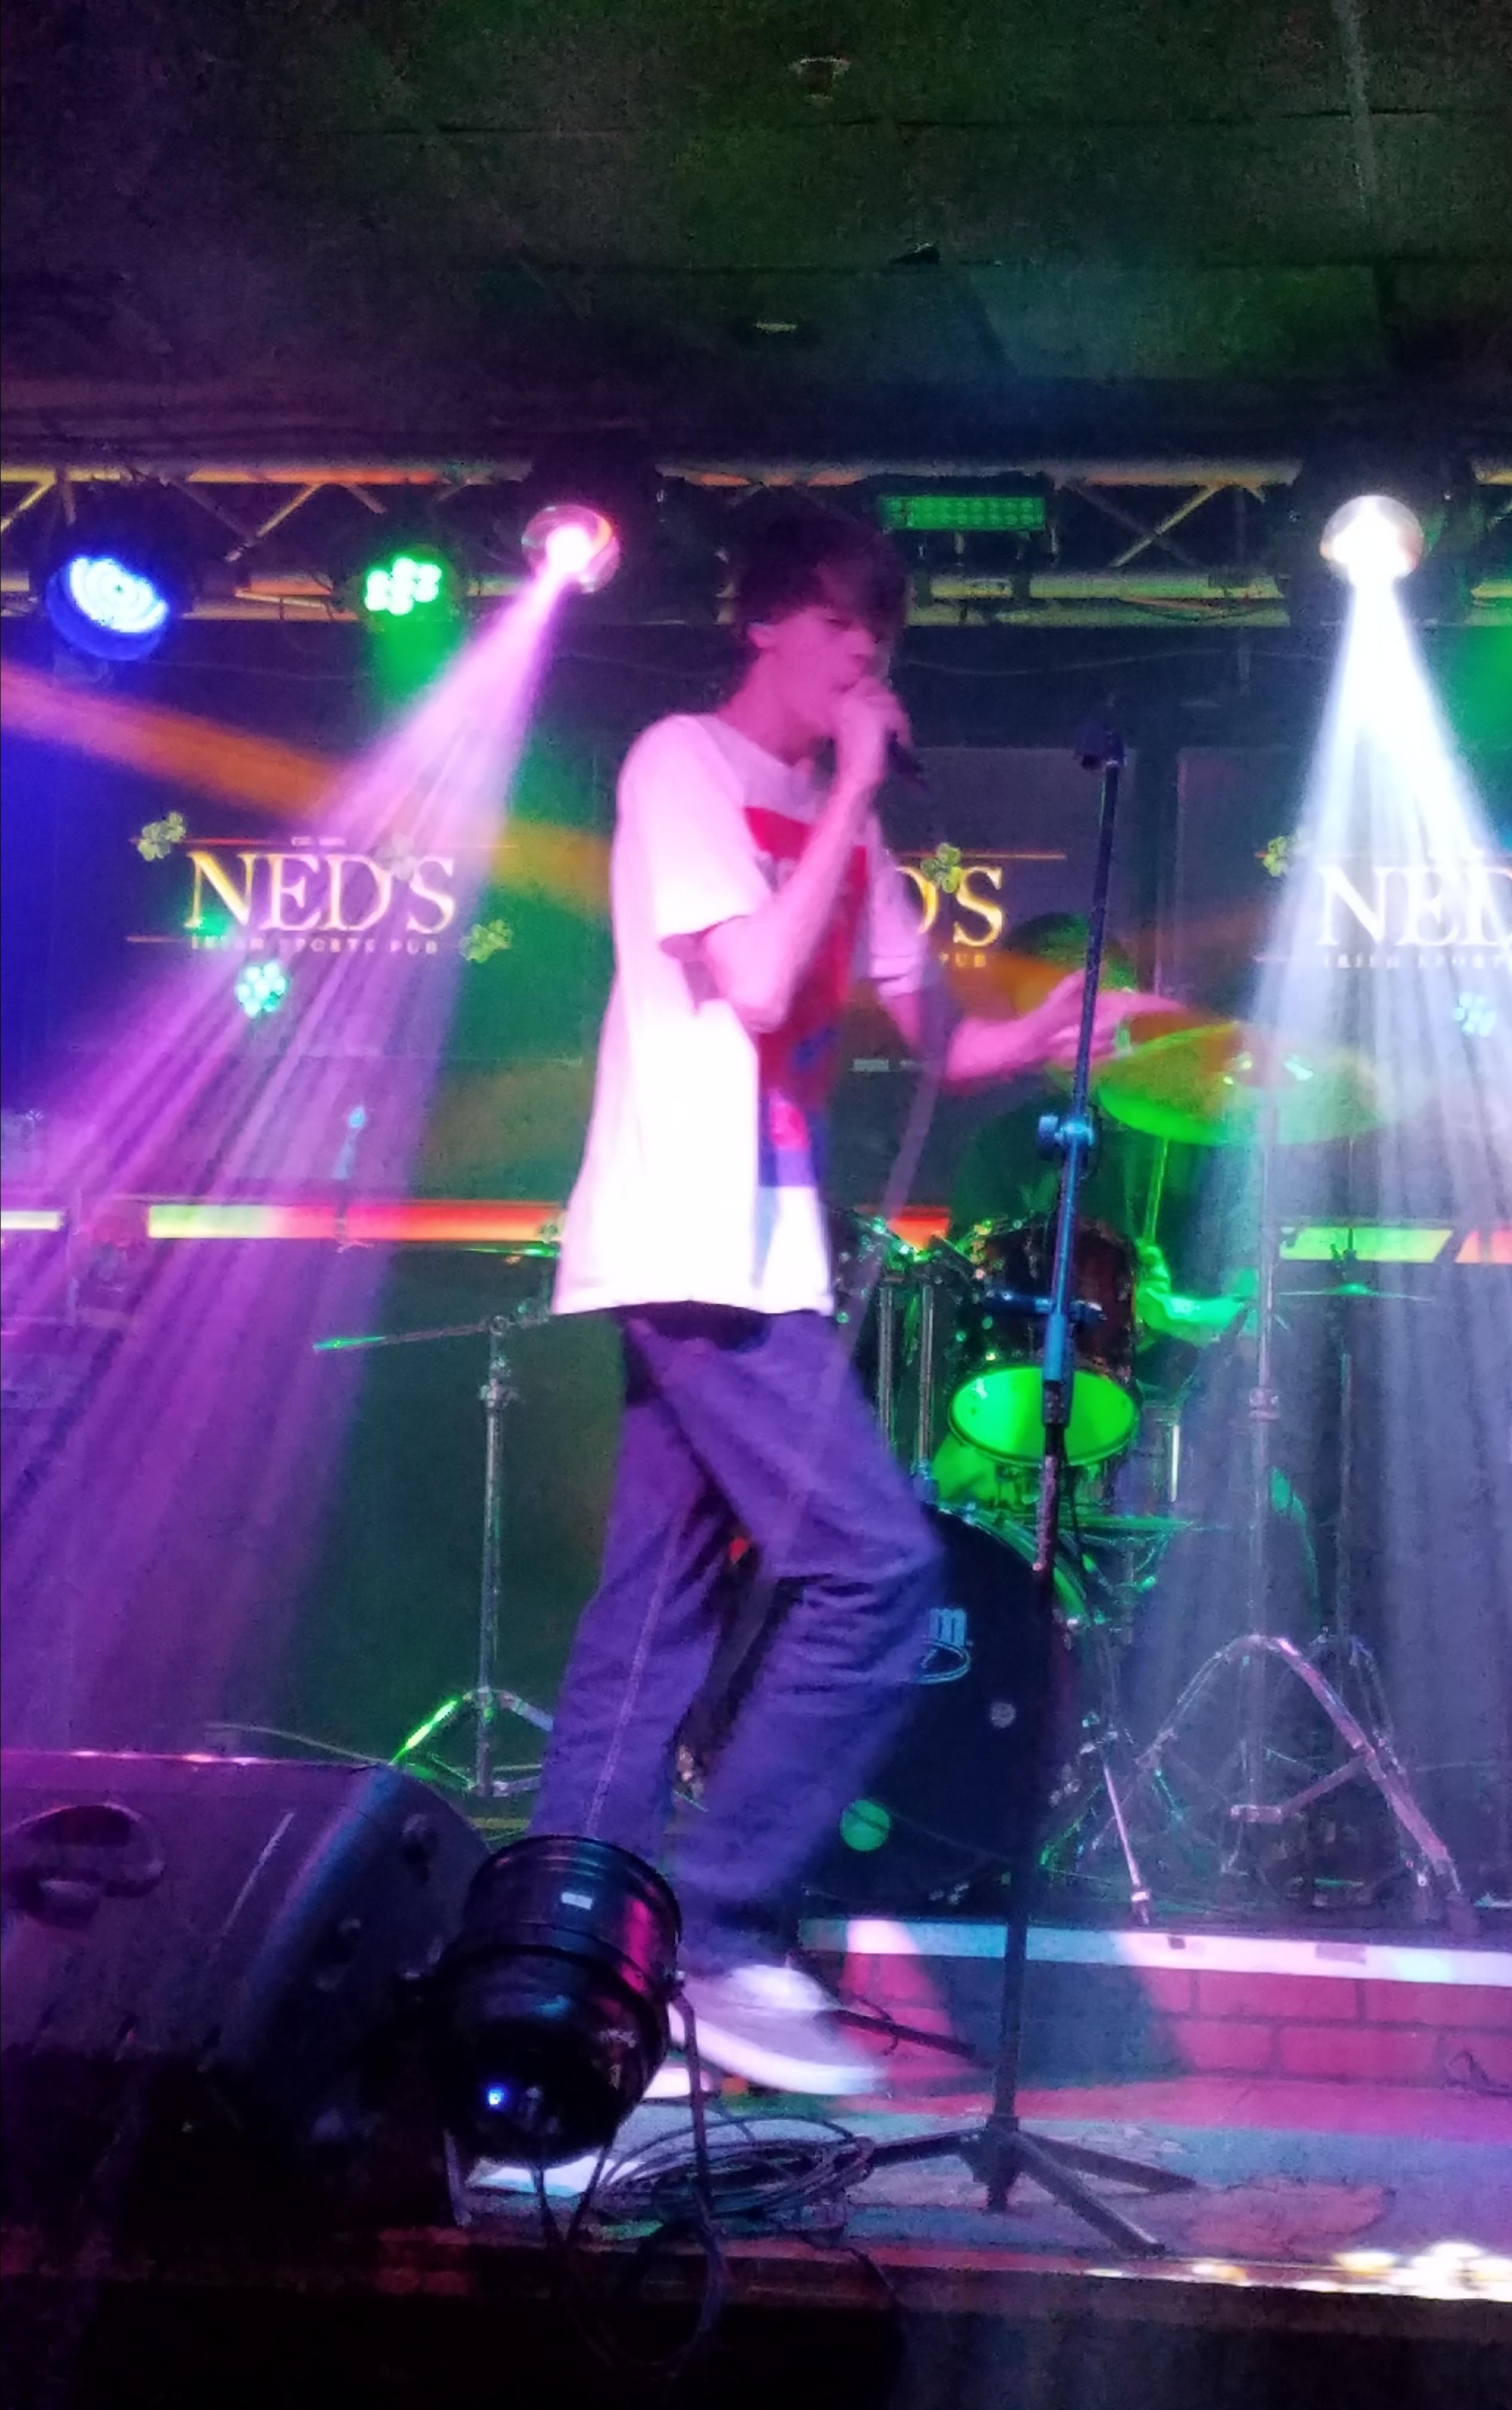 FUSE, Teen Rock Band, Maryland, Award Winning Band, Drew Reuschlein